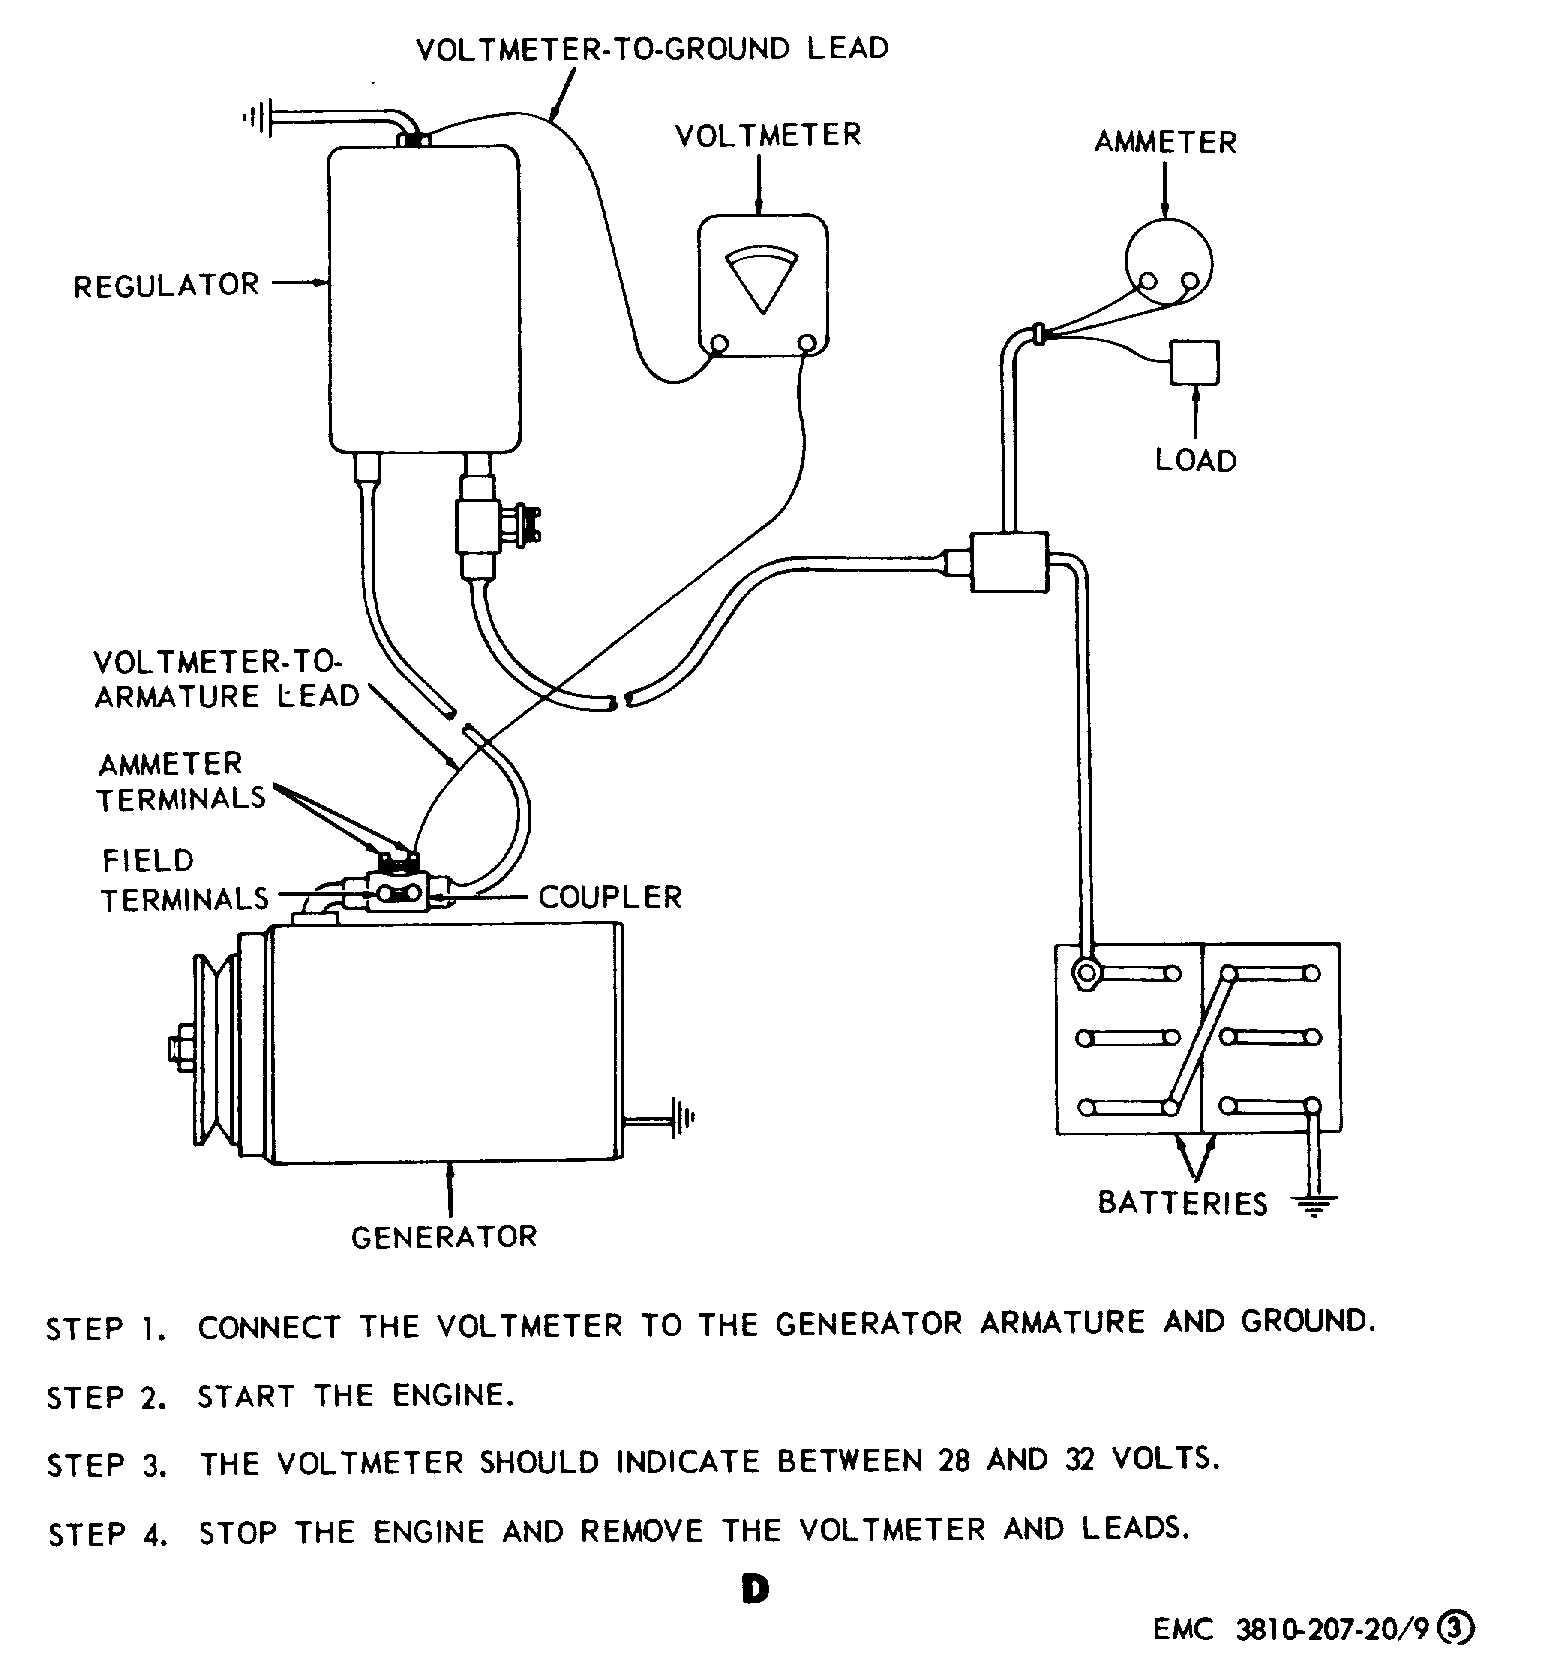 Kohler Voltage Regulator Wiring Diagram How to Test Kohler Voltage Regulator Ebay Wiring Diagram Ponents Of Kohler Voltage Regulator Wiring Diagram